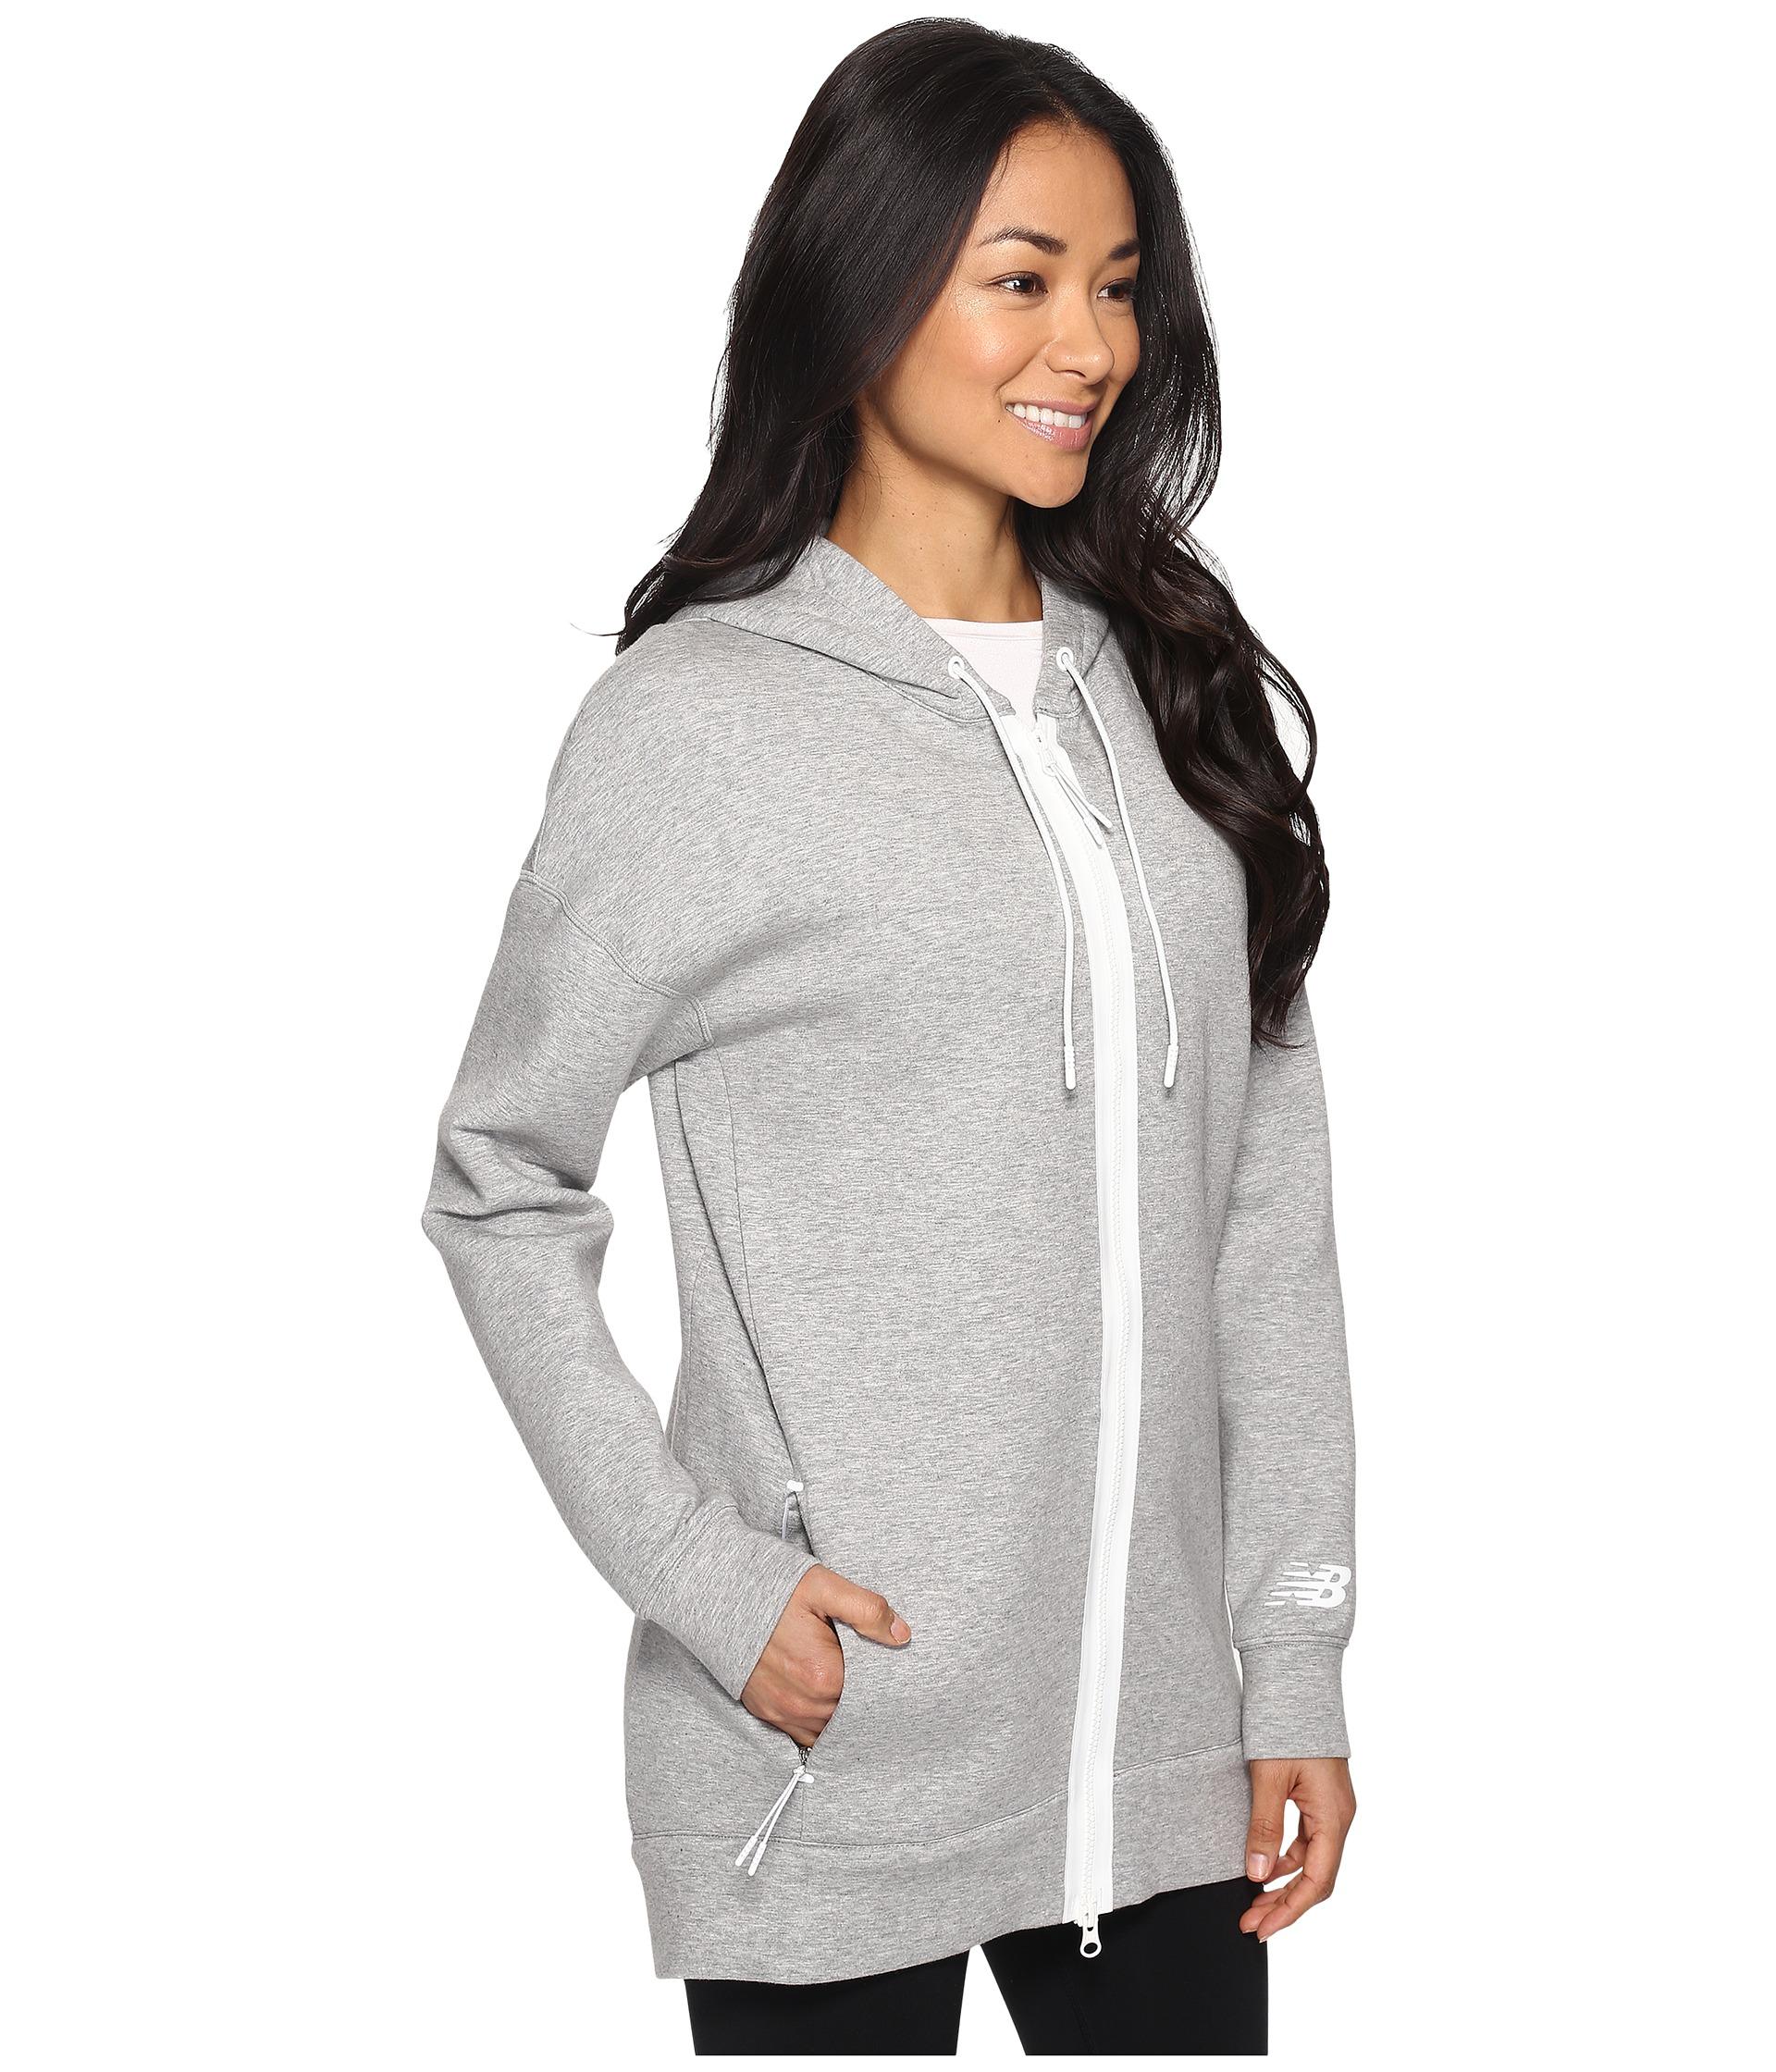 new balance sport style fleece hoodie athletic grey. Black Bedroom Furniture Sets. Home Design Ideas